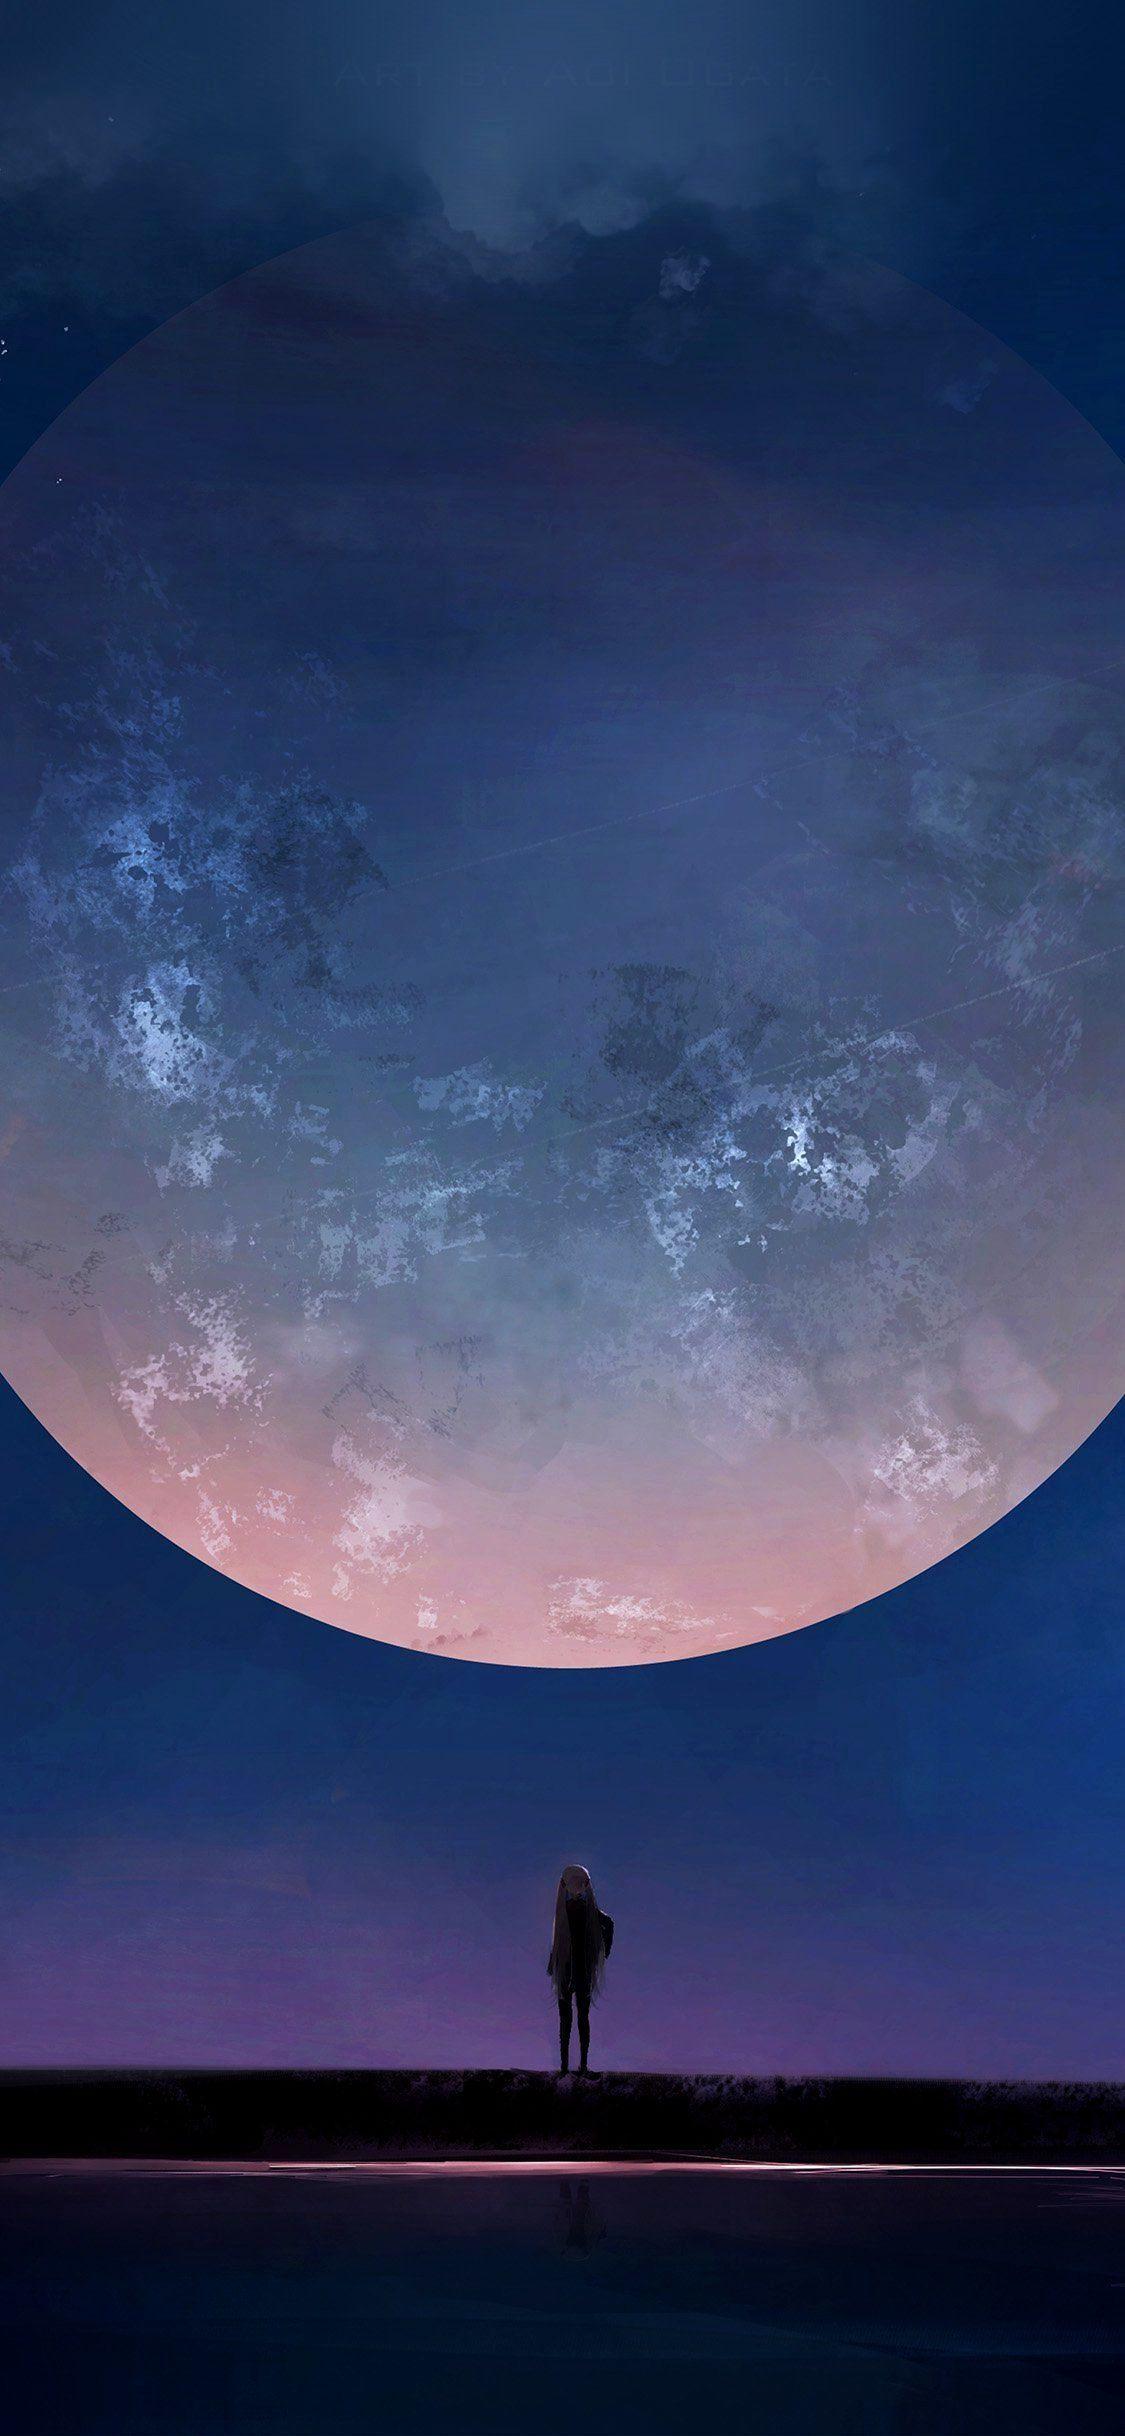 Night Sky Wallpaper 4K Iphone Trick iphone night